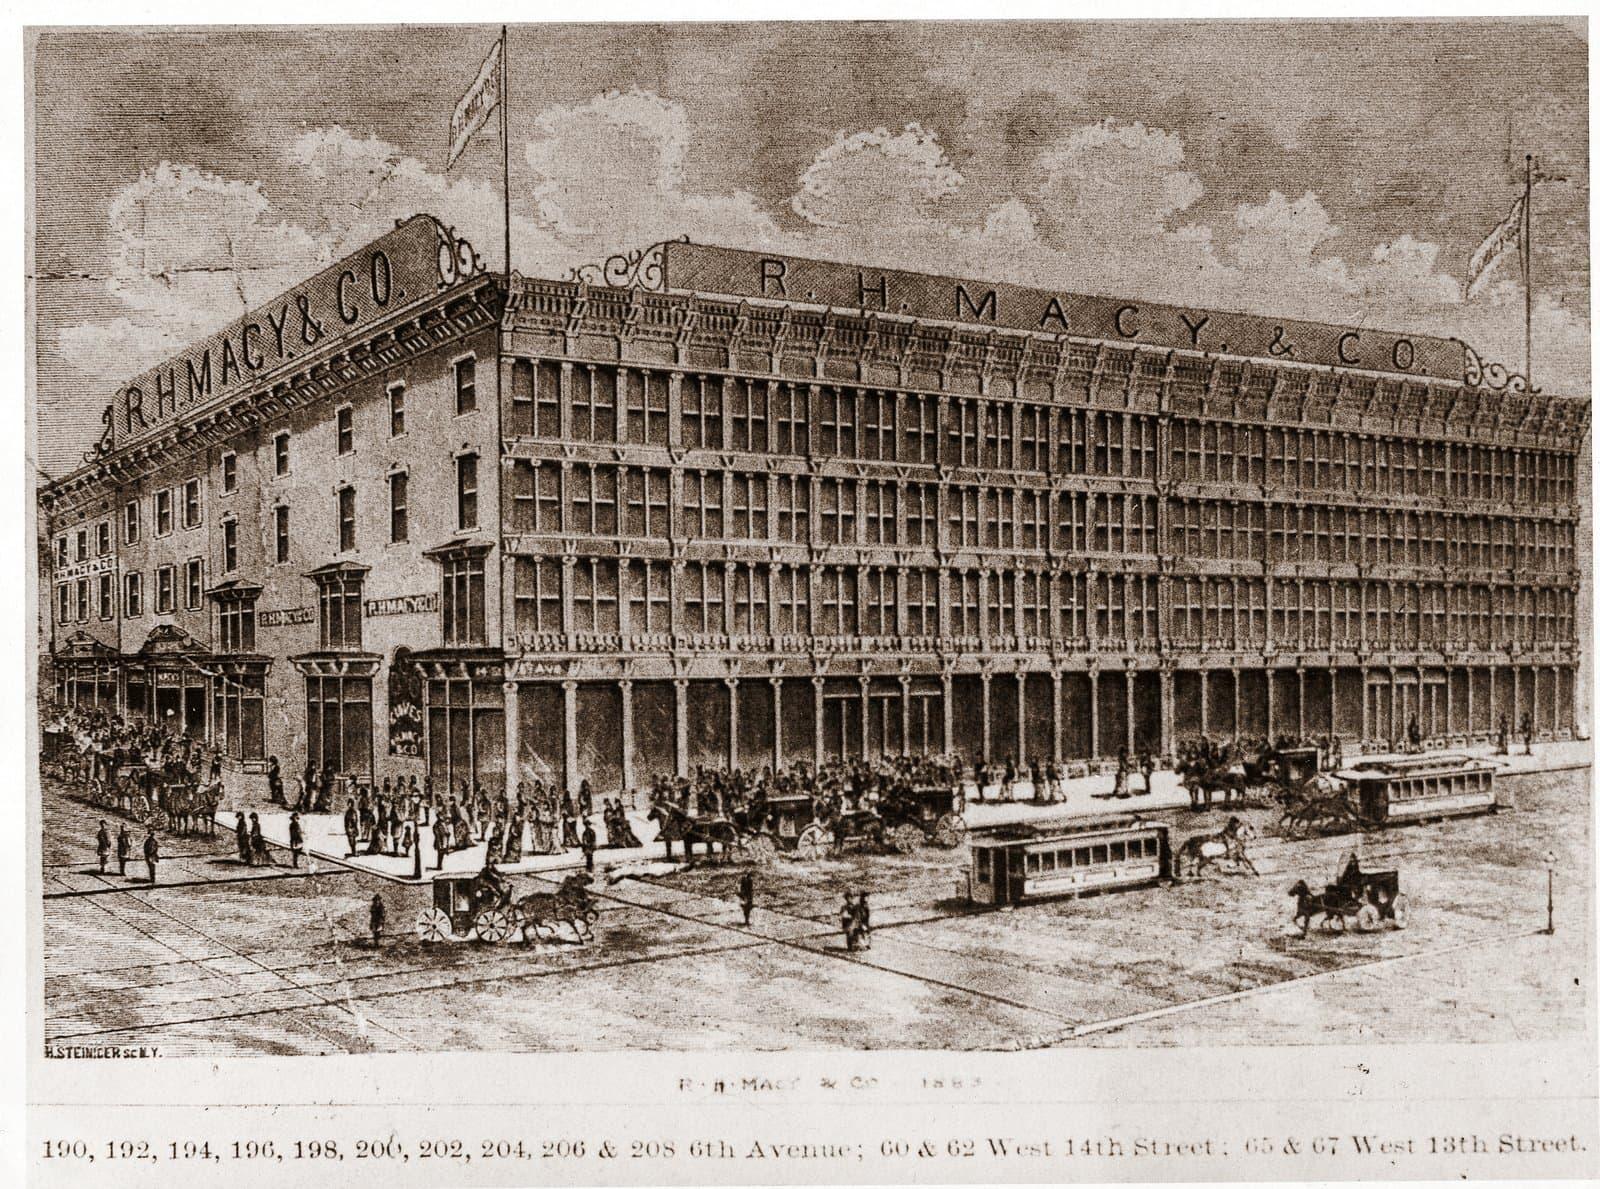 Macy'st 14th Street 6th Avenue NYC 1883